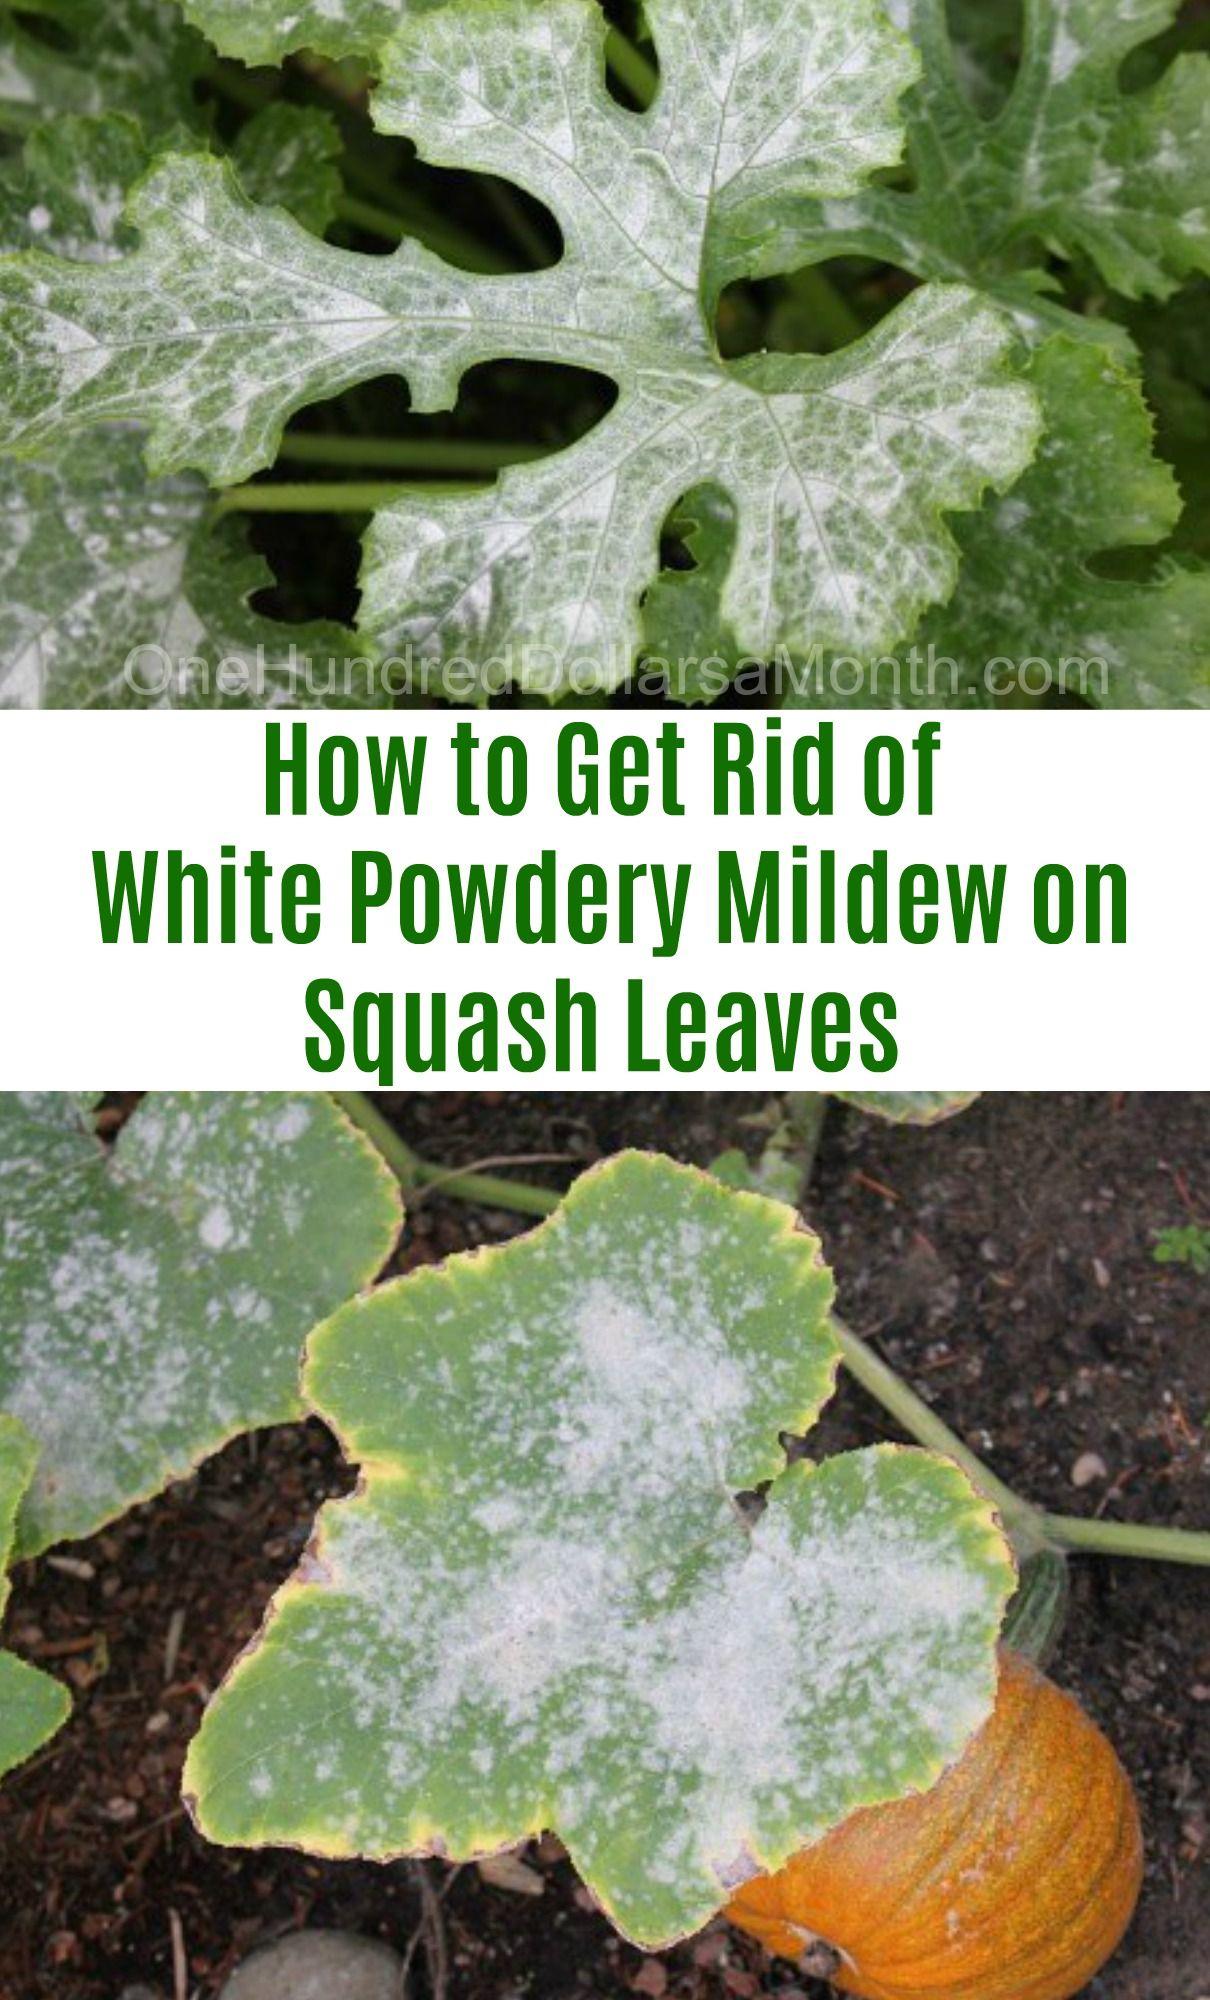 230a5aa31b703c13b4e5fd5de0af9b85 - How To Get Rid Of White Mold On Cucumber Plants